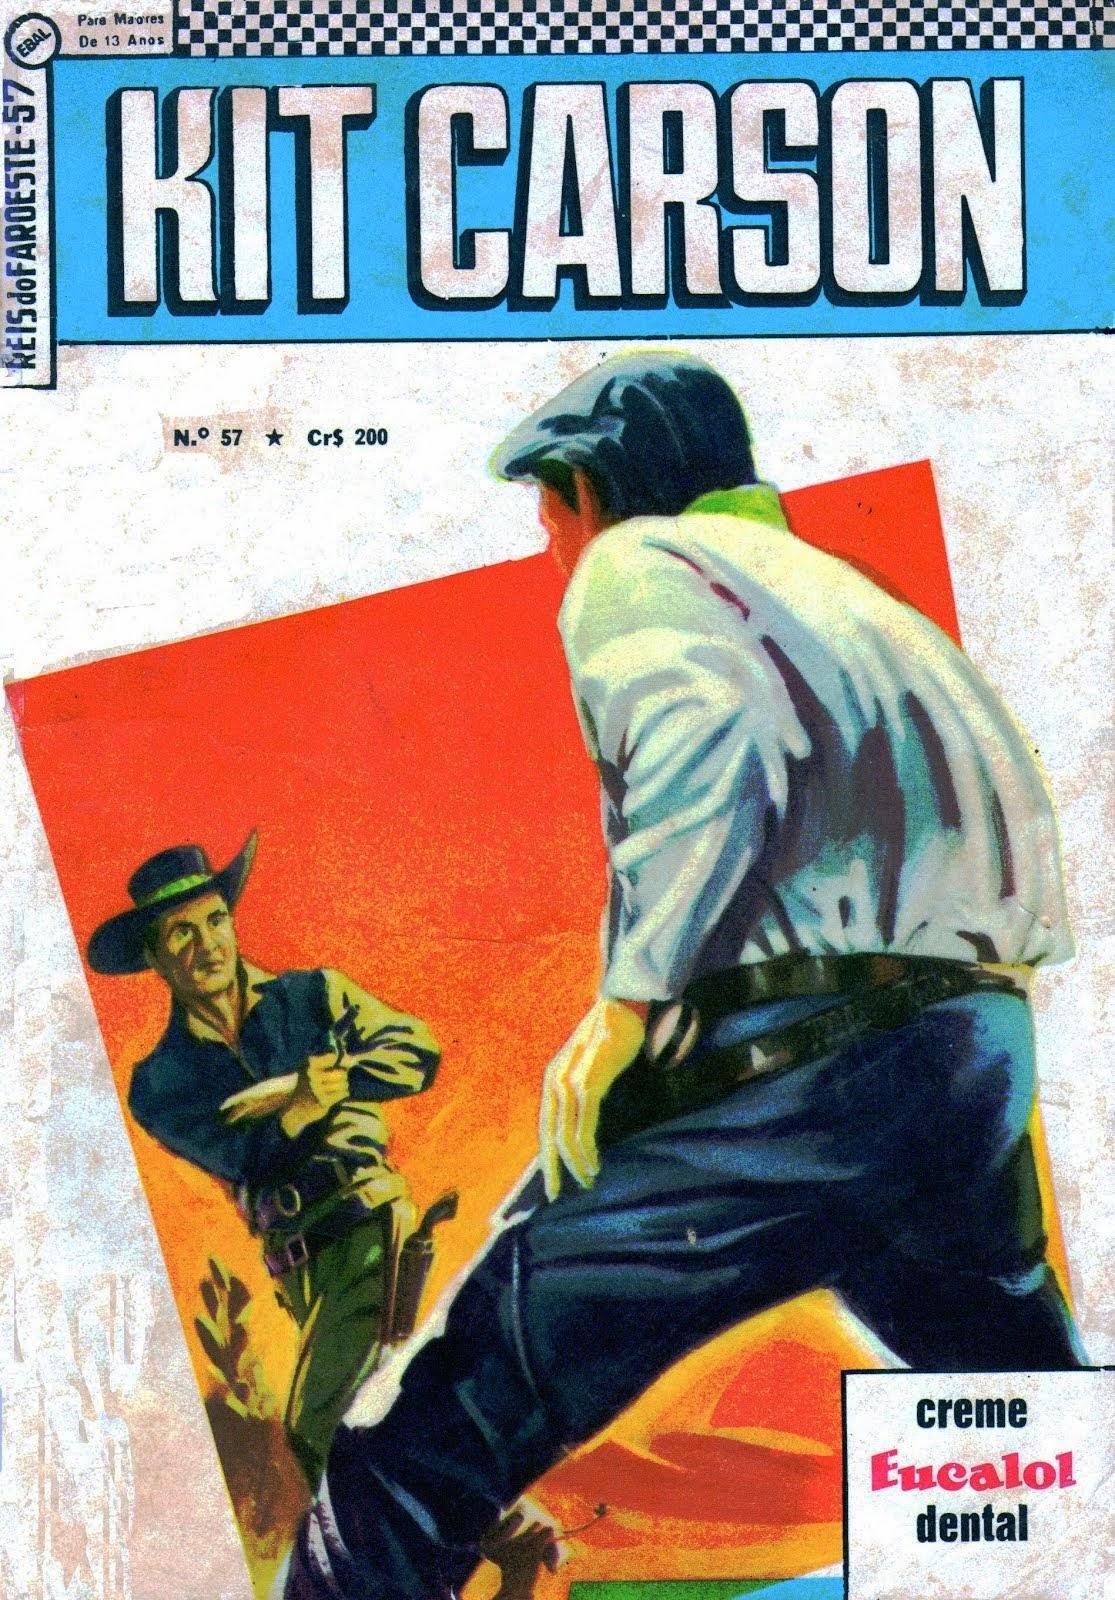 KIT CARSON   REIS DO FAROESTE  Nº 57 JUNHO 1966 - EDITORA BRASIL-AMÉRICA - EBAL HQ WESTERN (FAR-WES